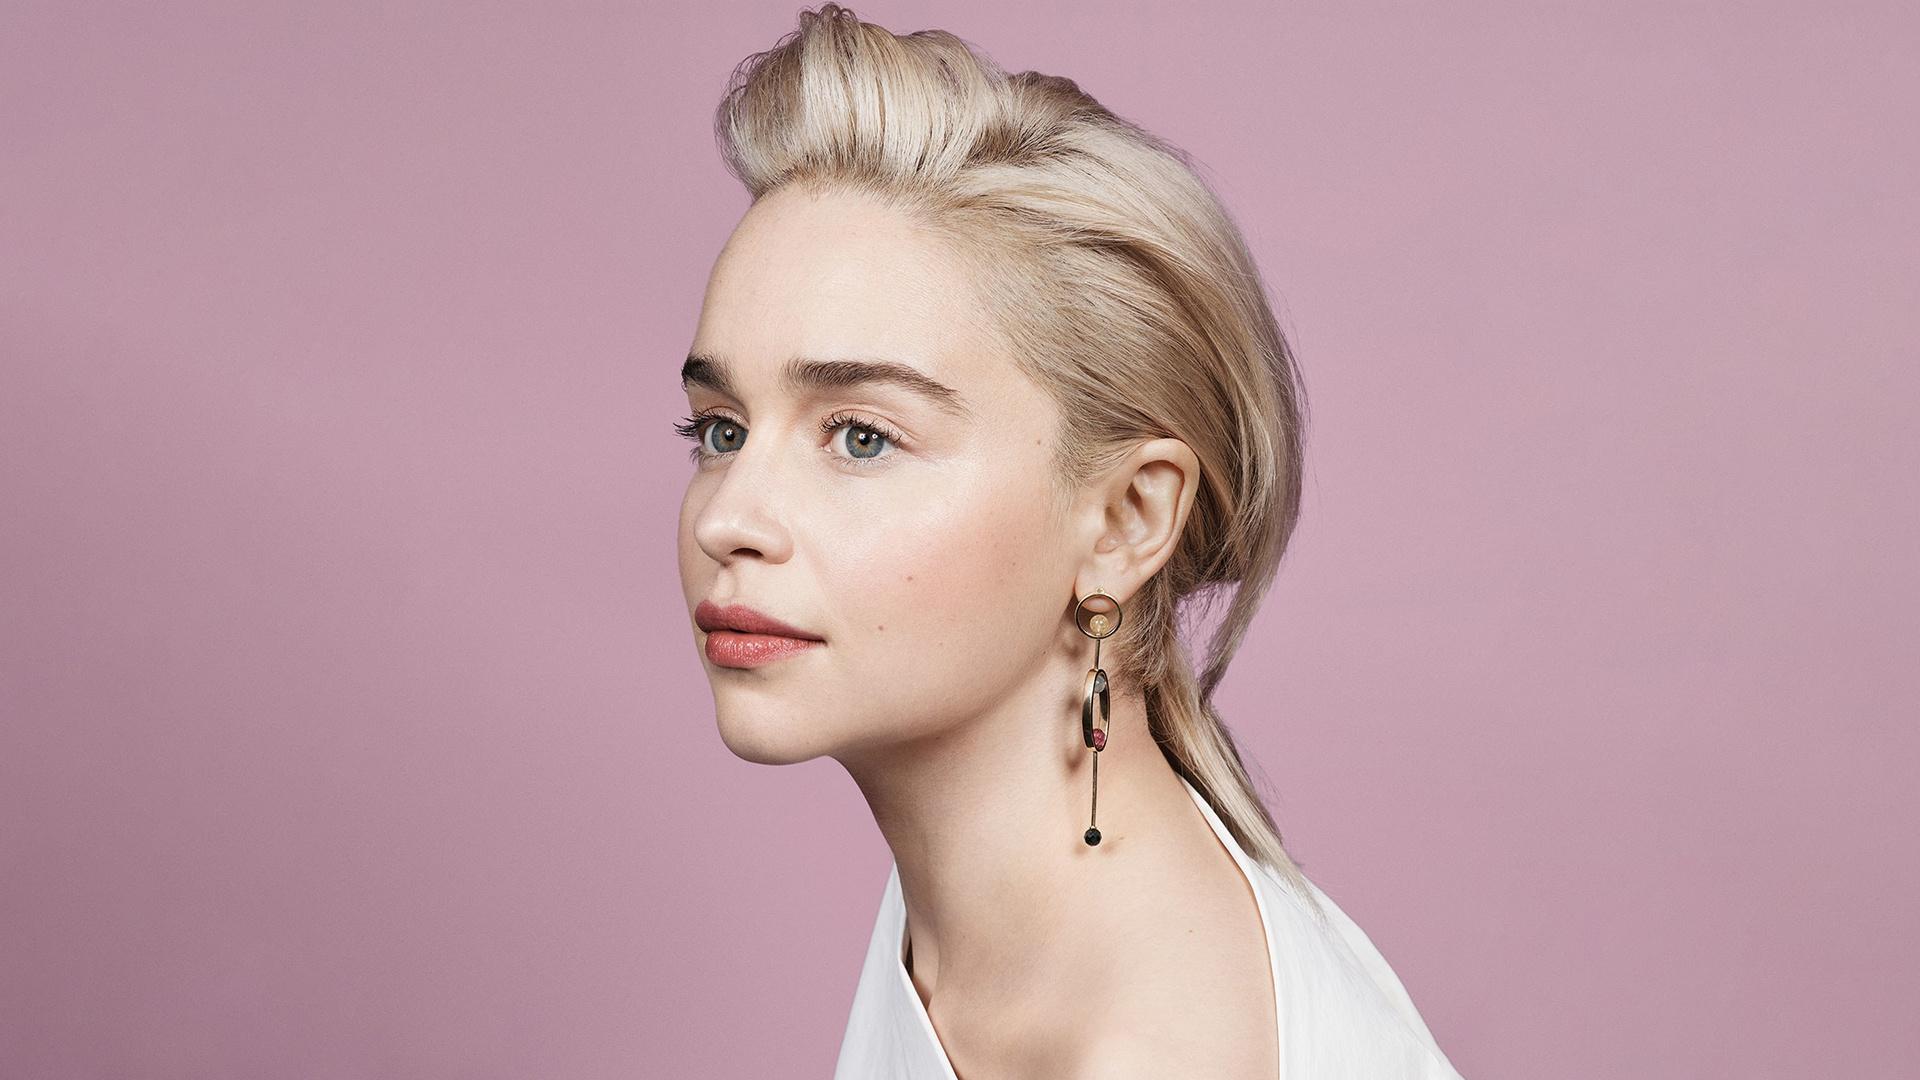 Download 1920x1200 Wallpaper Emilia Clarke Beautiful Face